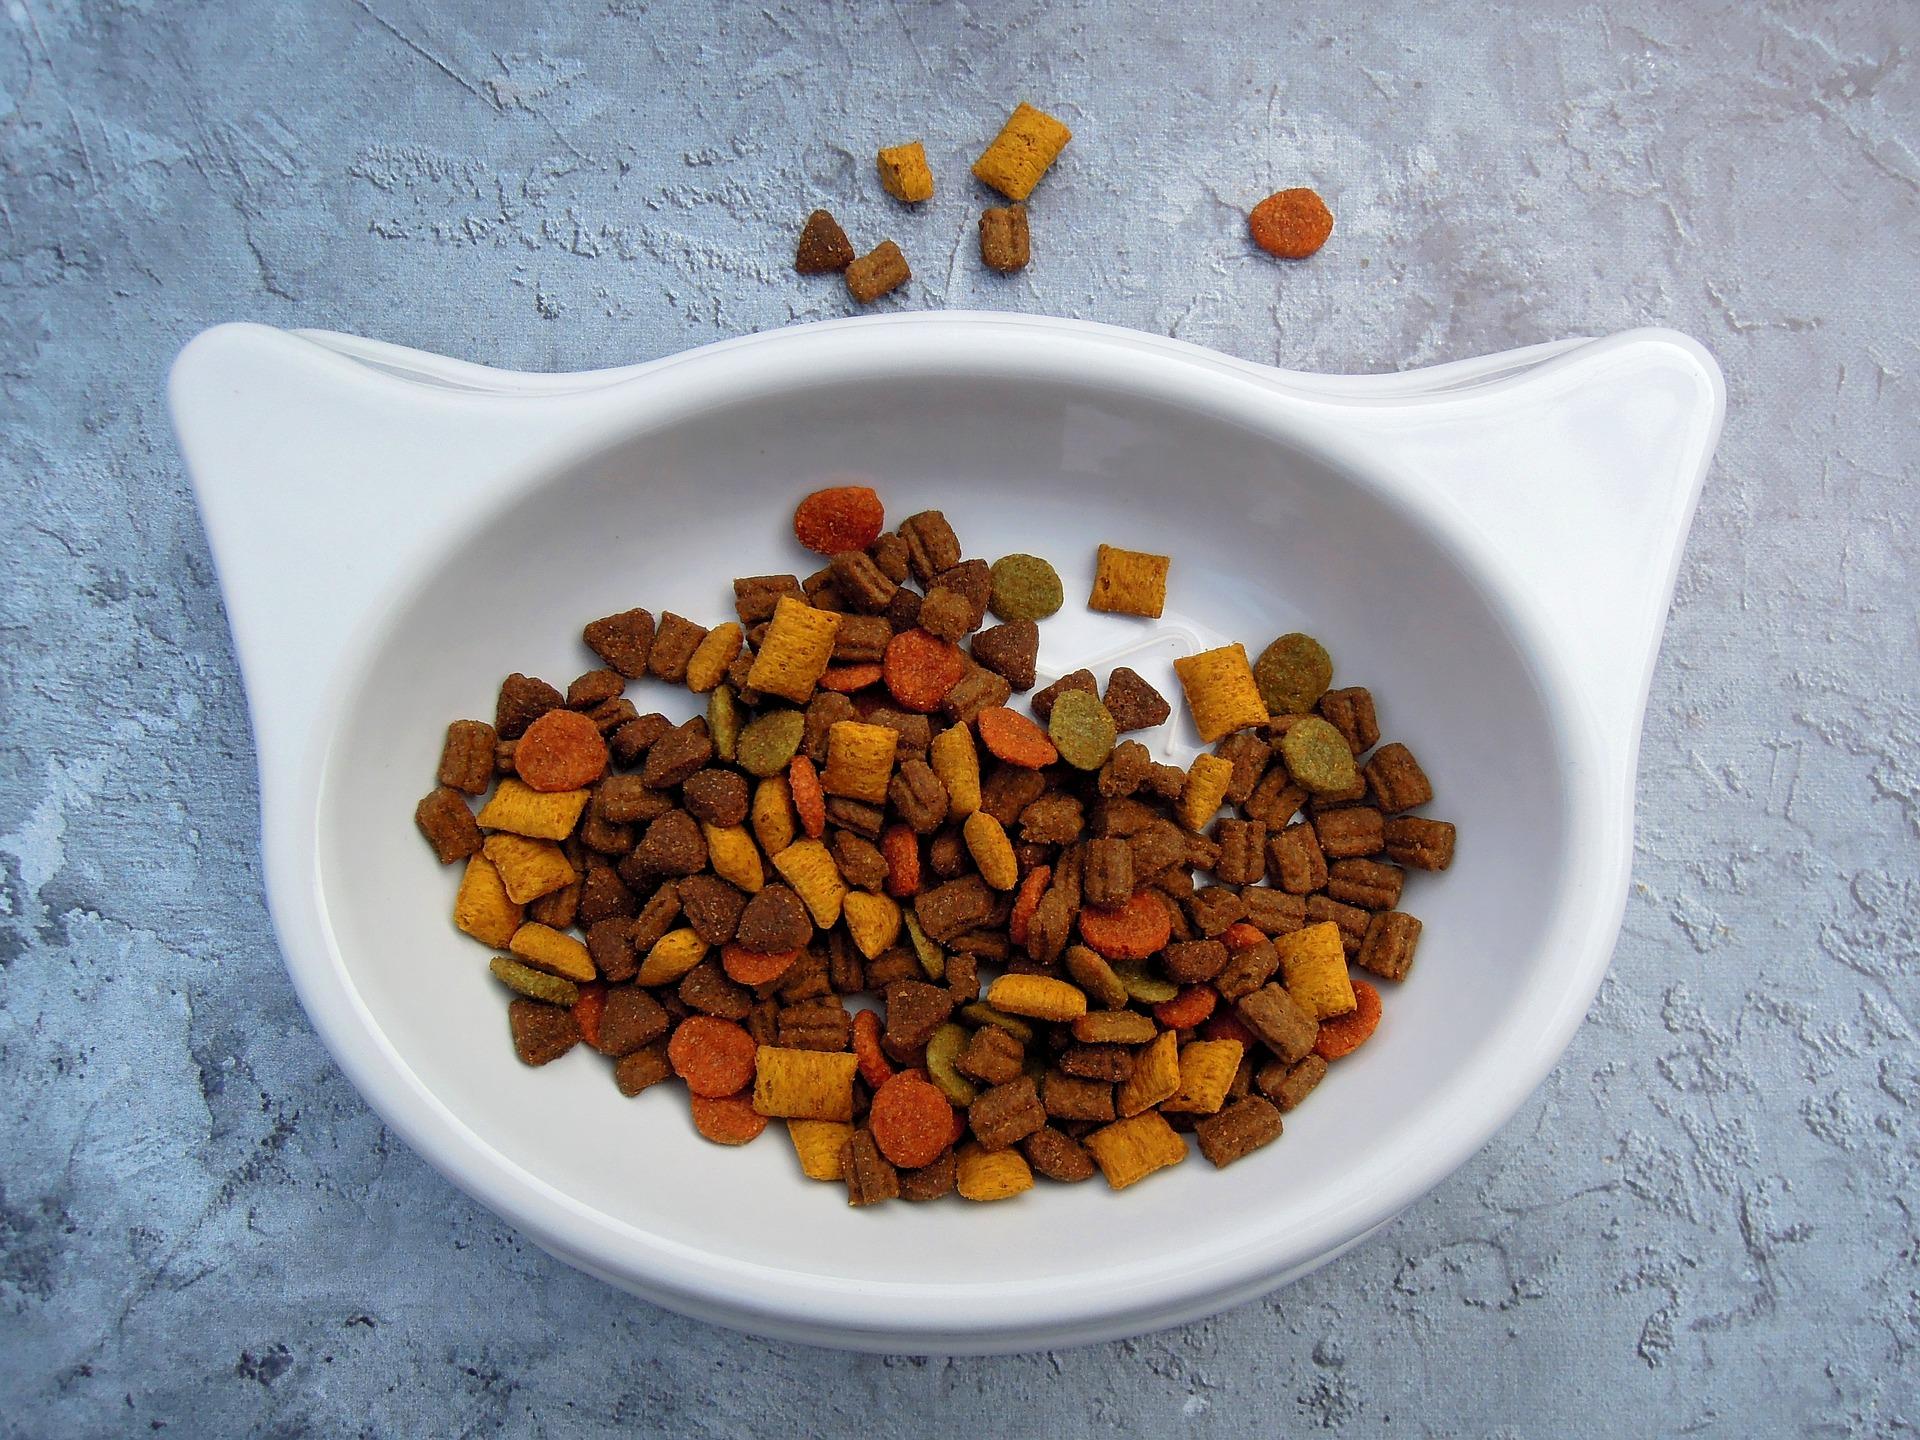 Bowl shaped like a cat full of dry food